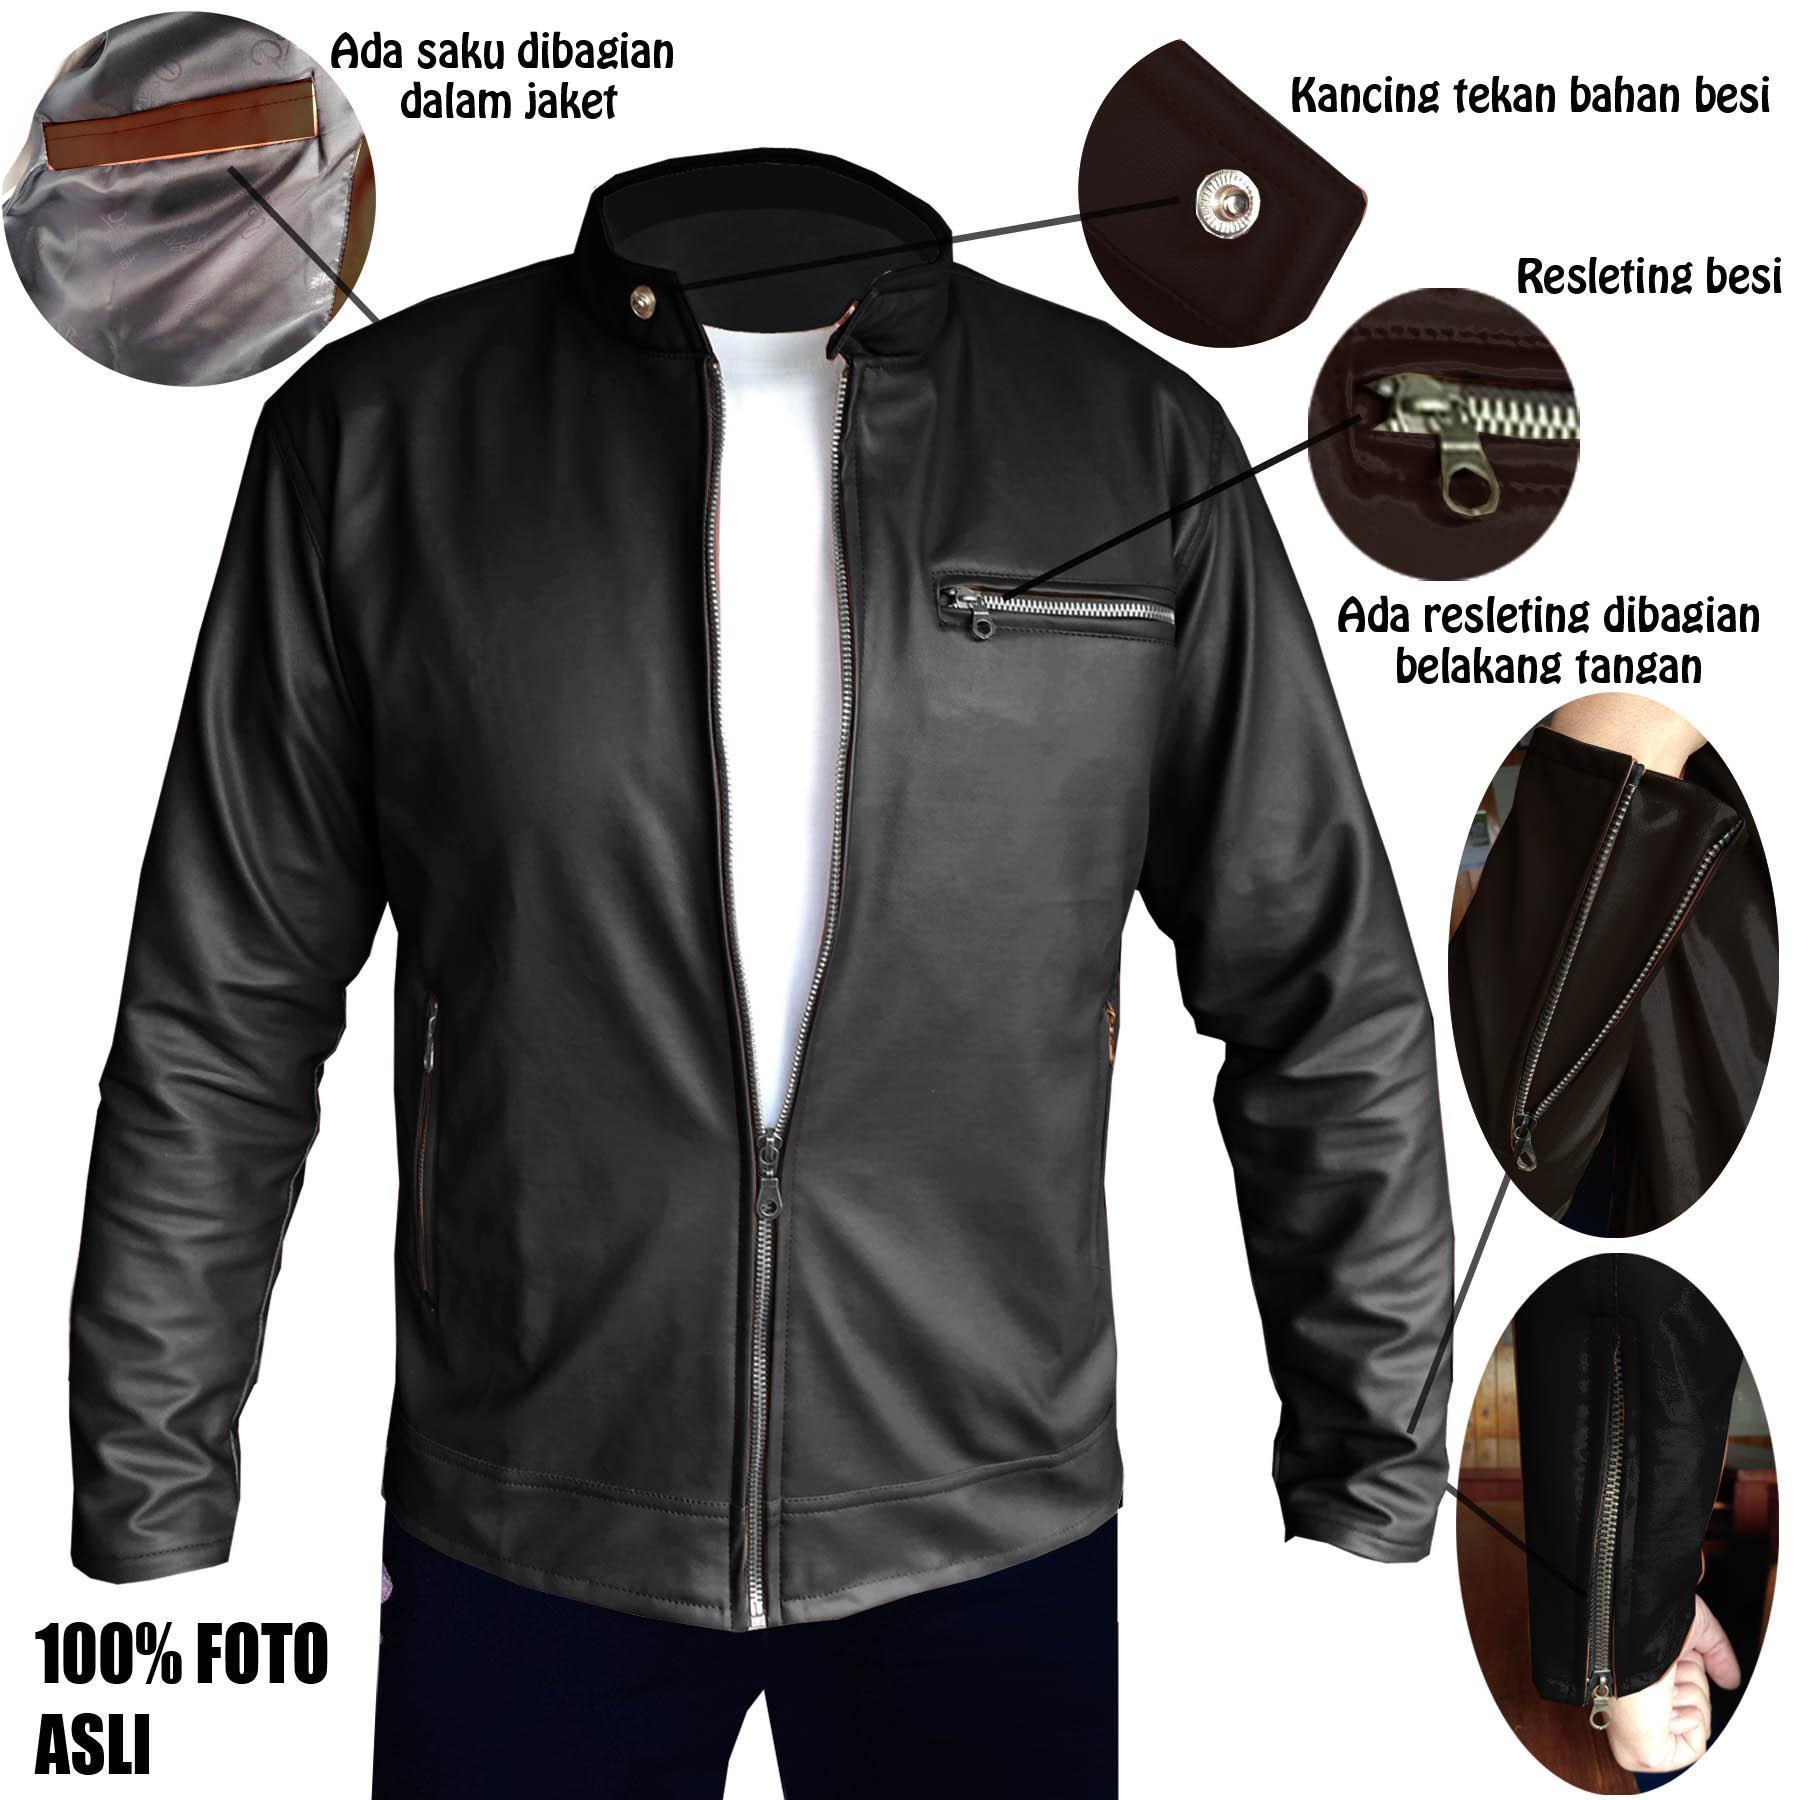 Fs Fashion- Jaket SK Kulit Pria Vienna Exclusive Series  HITAM-COKELAT  114a9b3b78